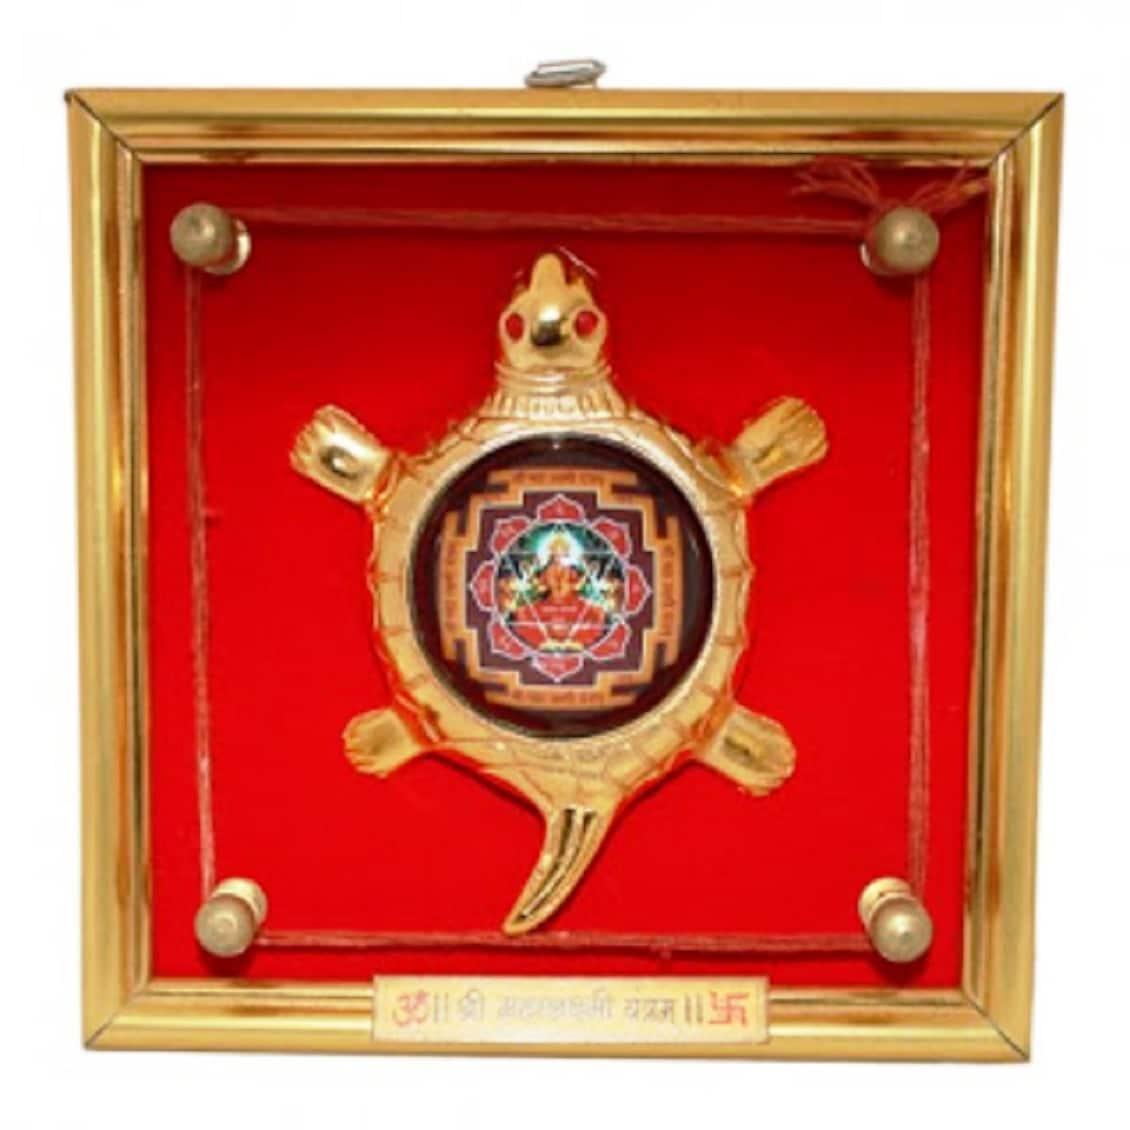 Numeroastro Shri Mahalaxmi Yantra On Brass Turtle | Tortoise In Frame For Wealth & Good Luck (Wall Hanging) (17 Cms) (1 Pc)